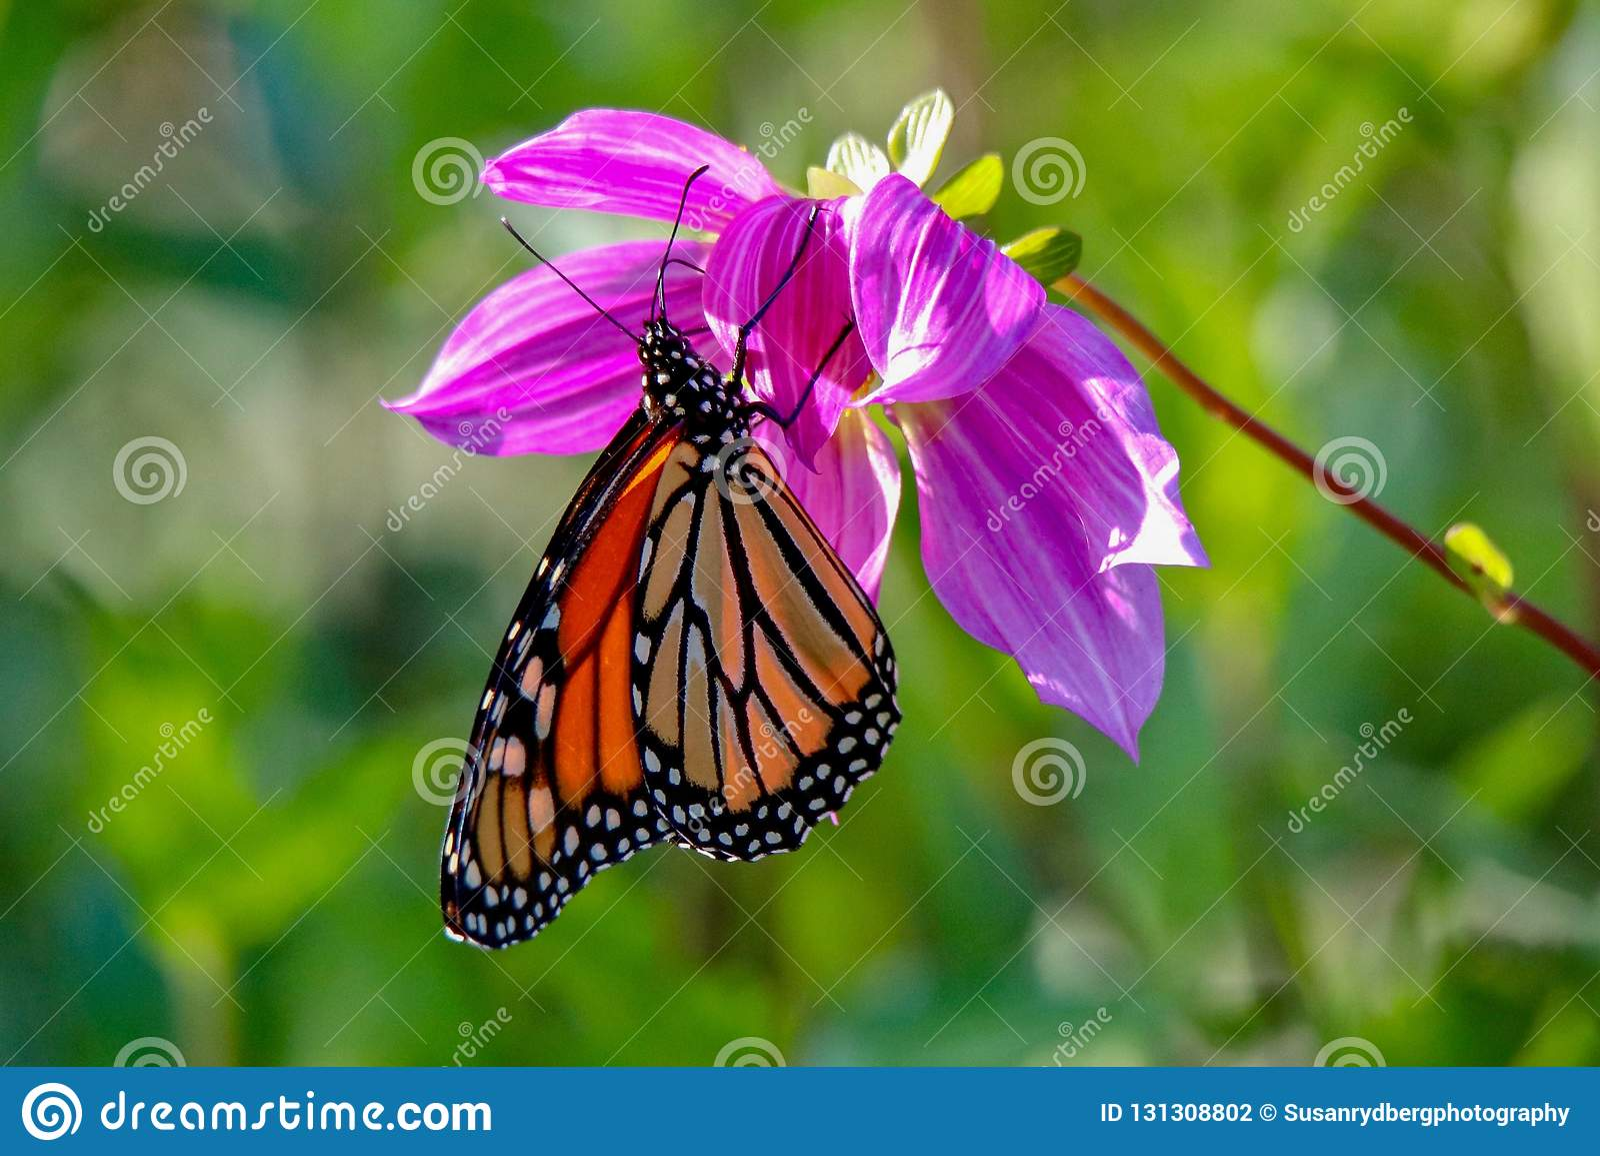 Beautiful Monarch Butterfly feeding on a pink dahlia in the sunlight